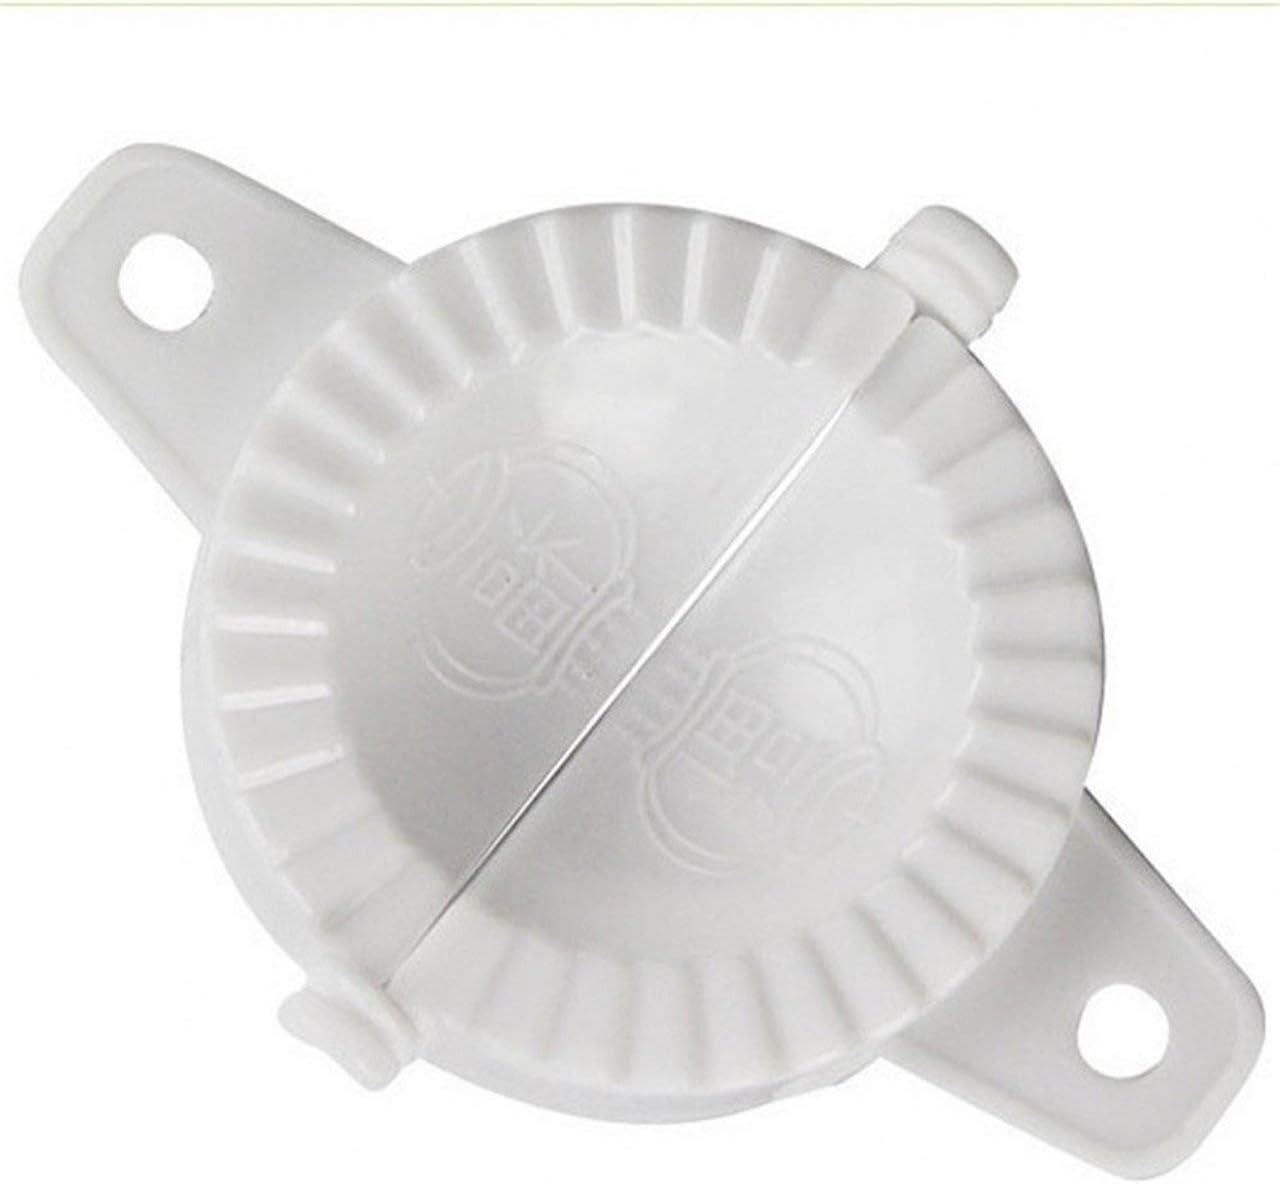 SZXCX Dumplings Maker Mold Dumpling Device Package Dumpling Mold Creative Kitchen Gadgets New Dumpling Mold Maker-White